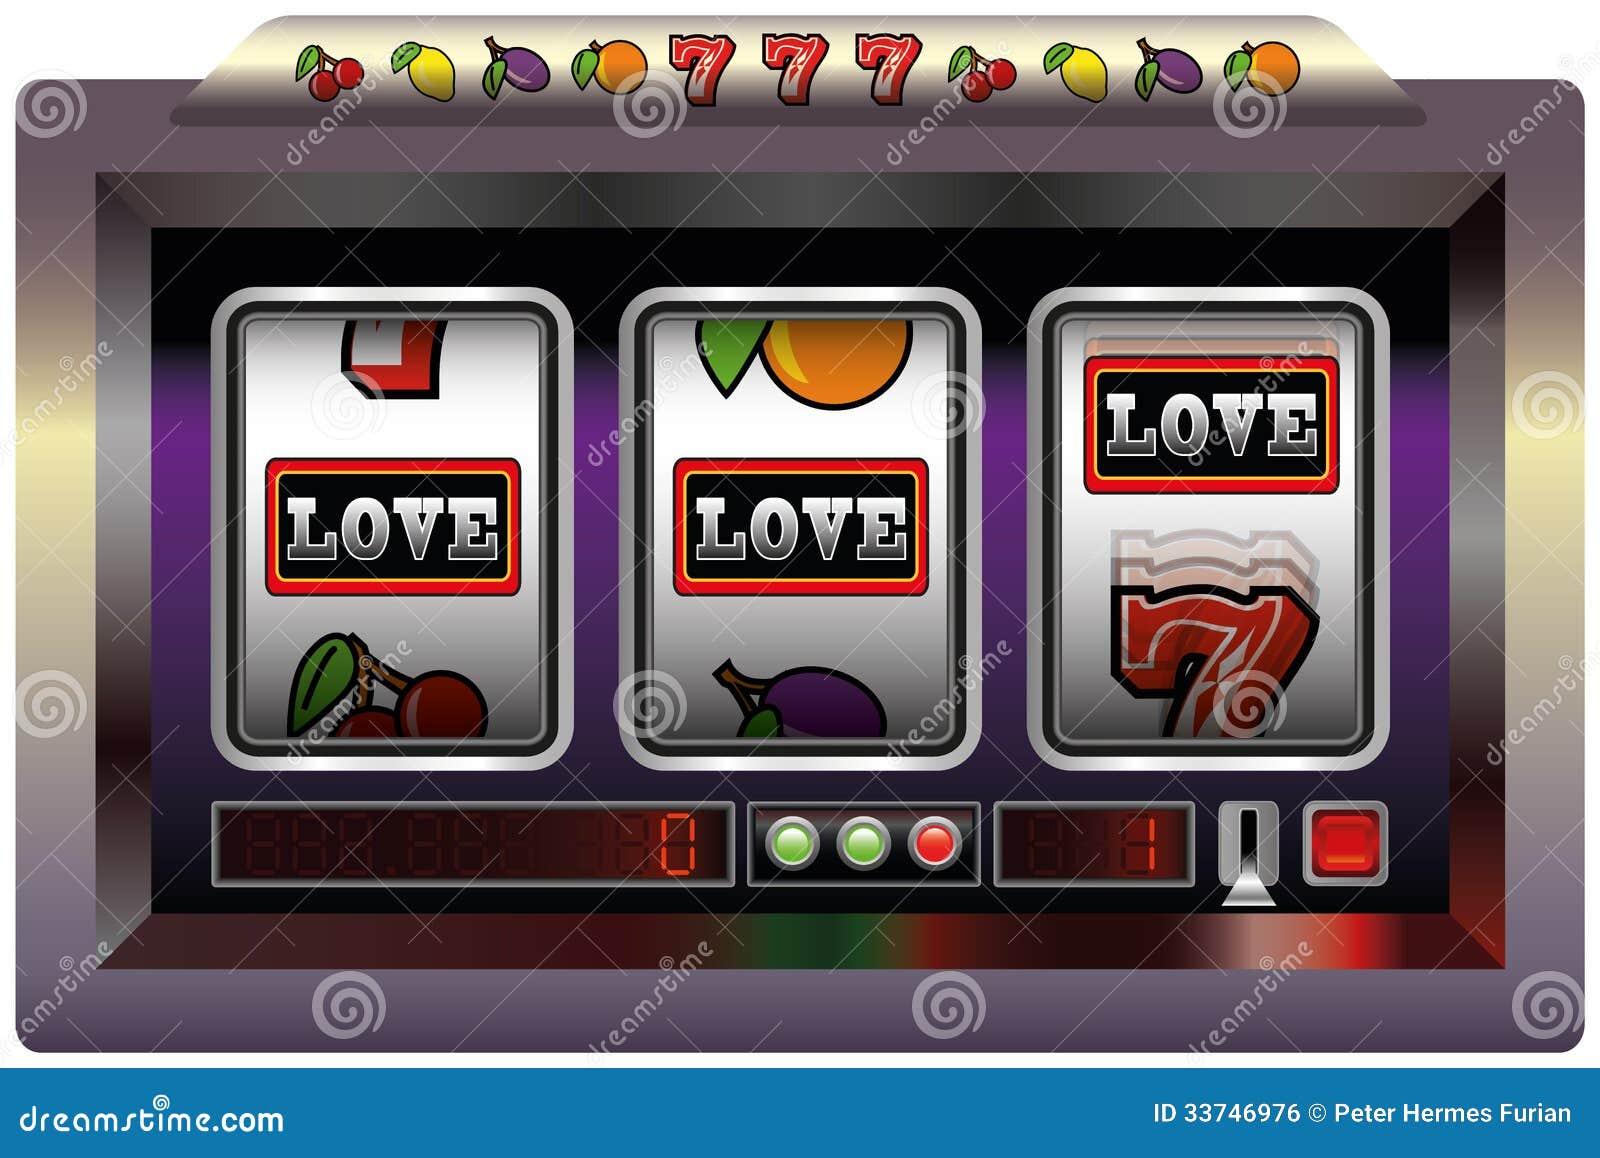 Love slot machine max casino com